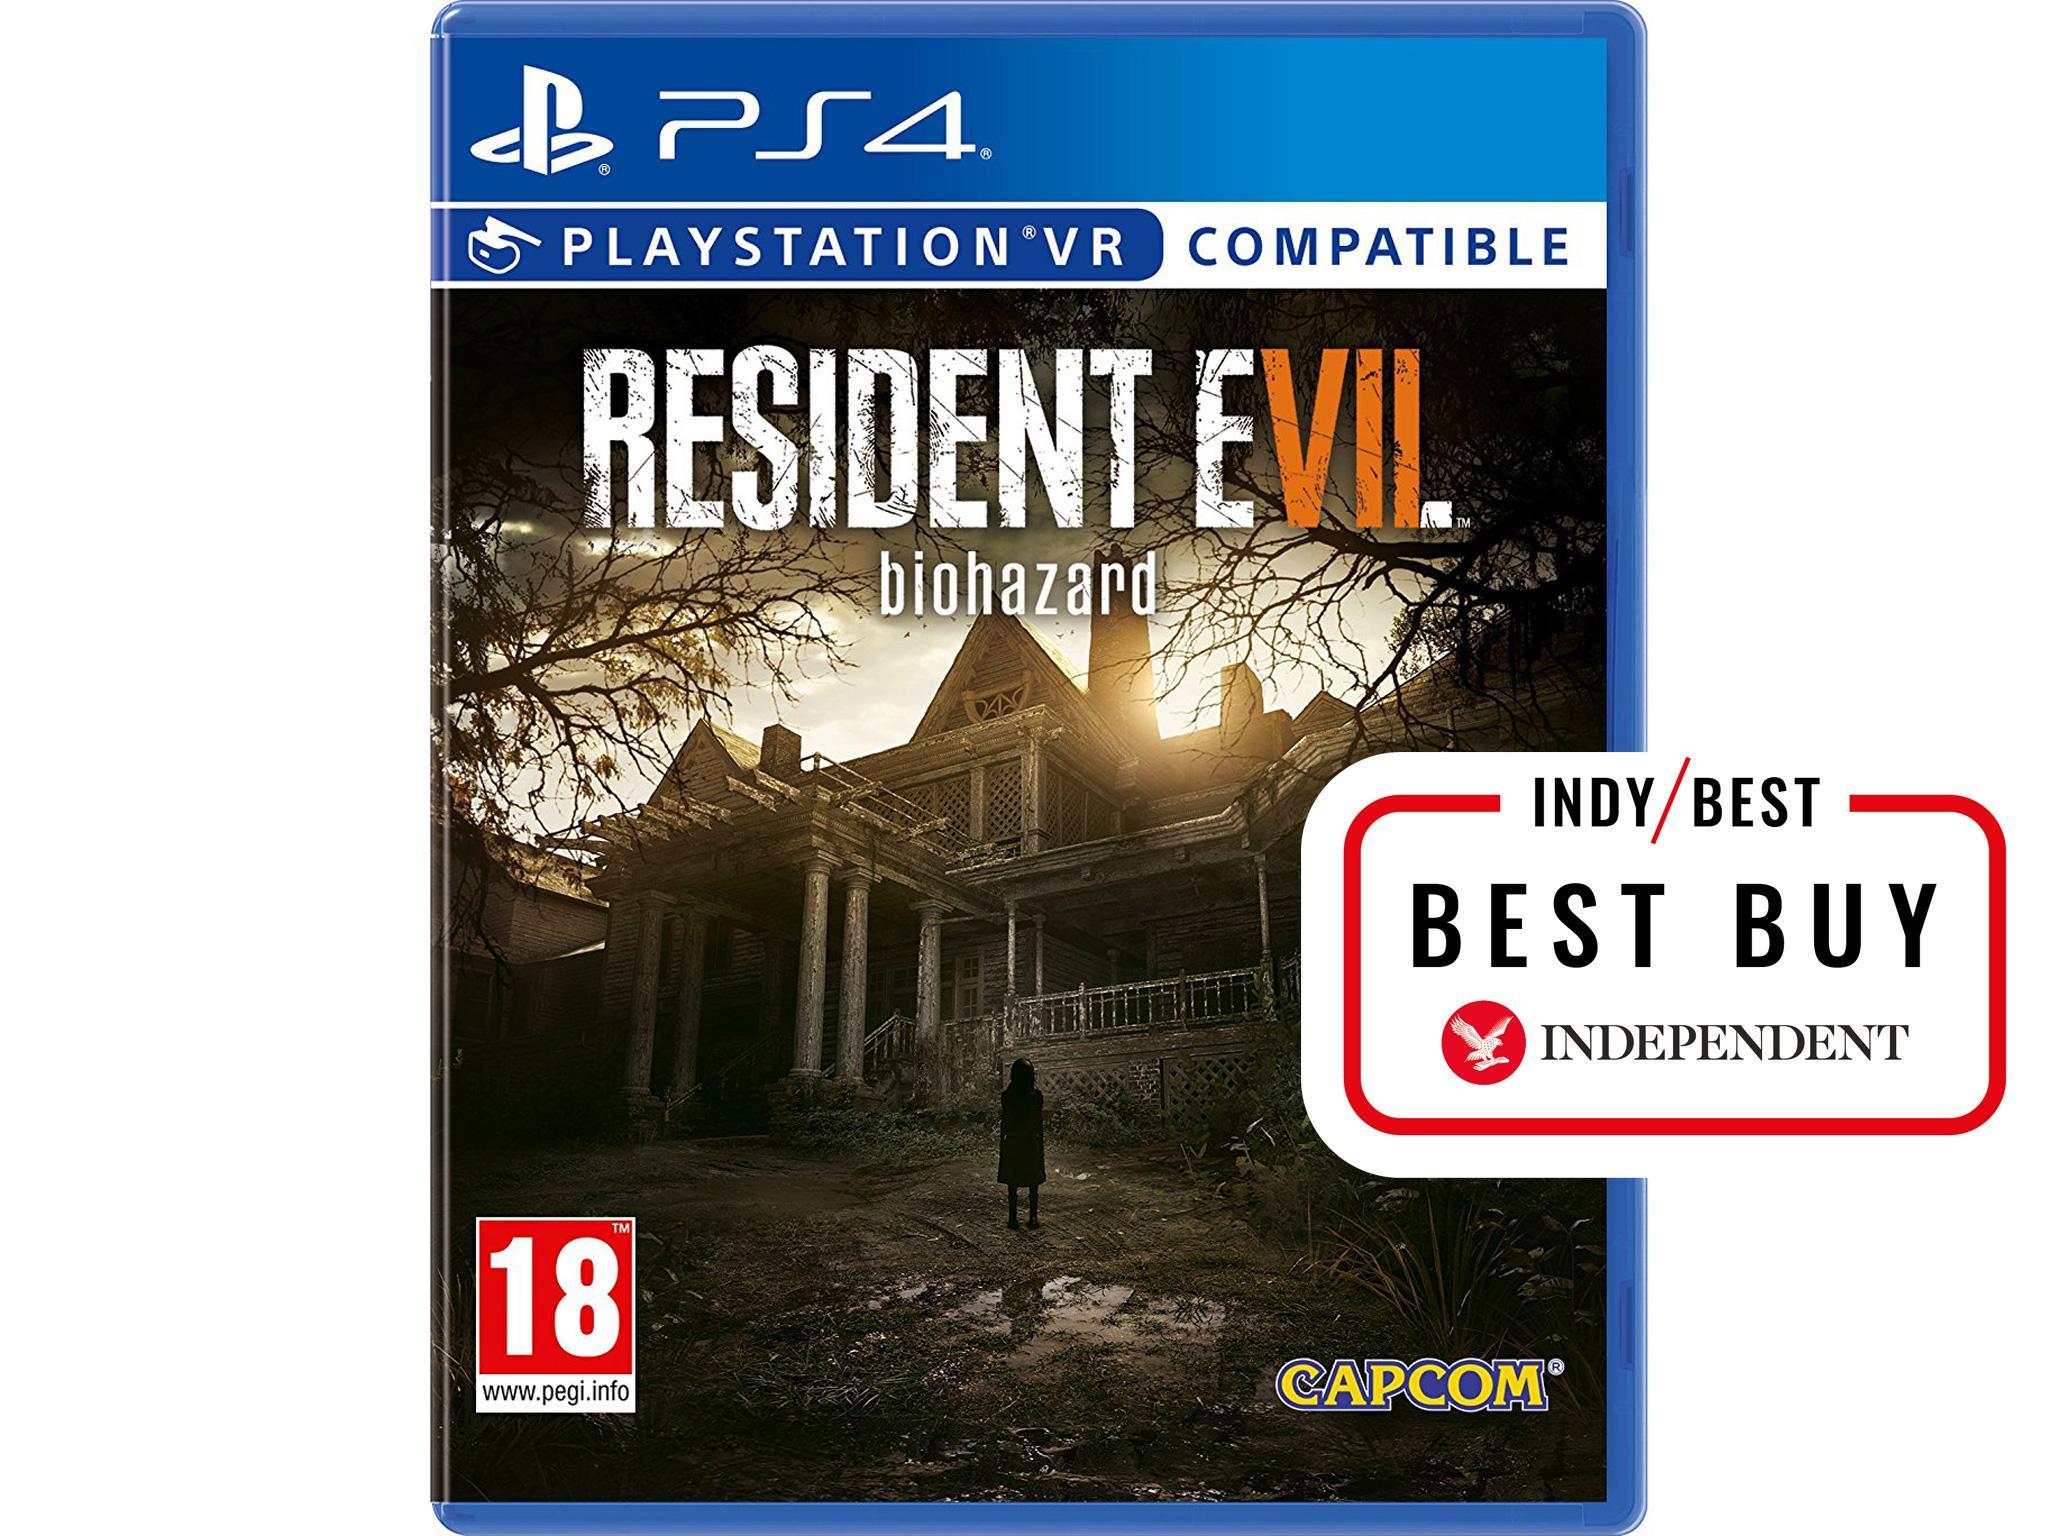 8 best PSVR games | The Independent